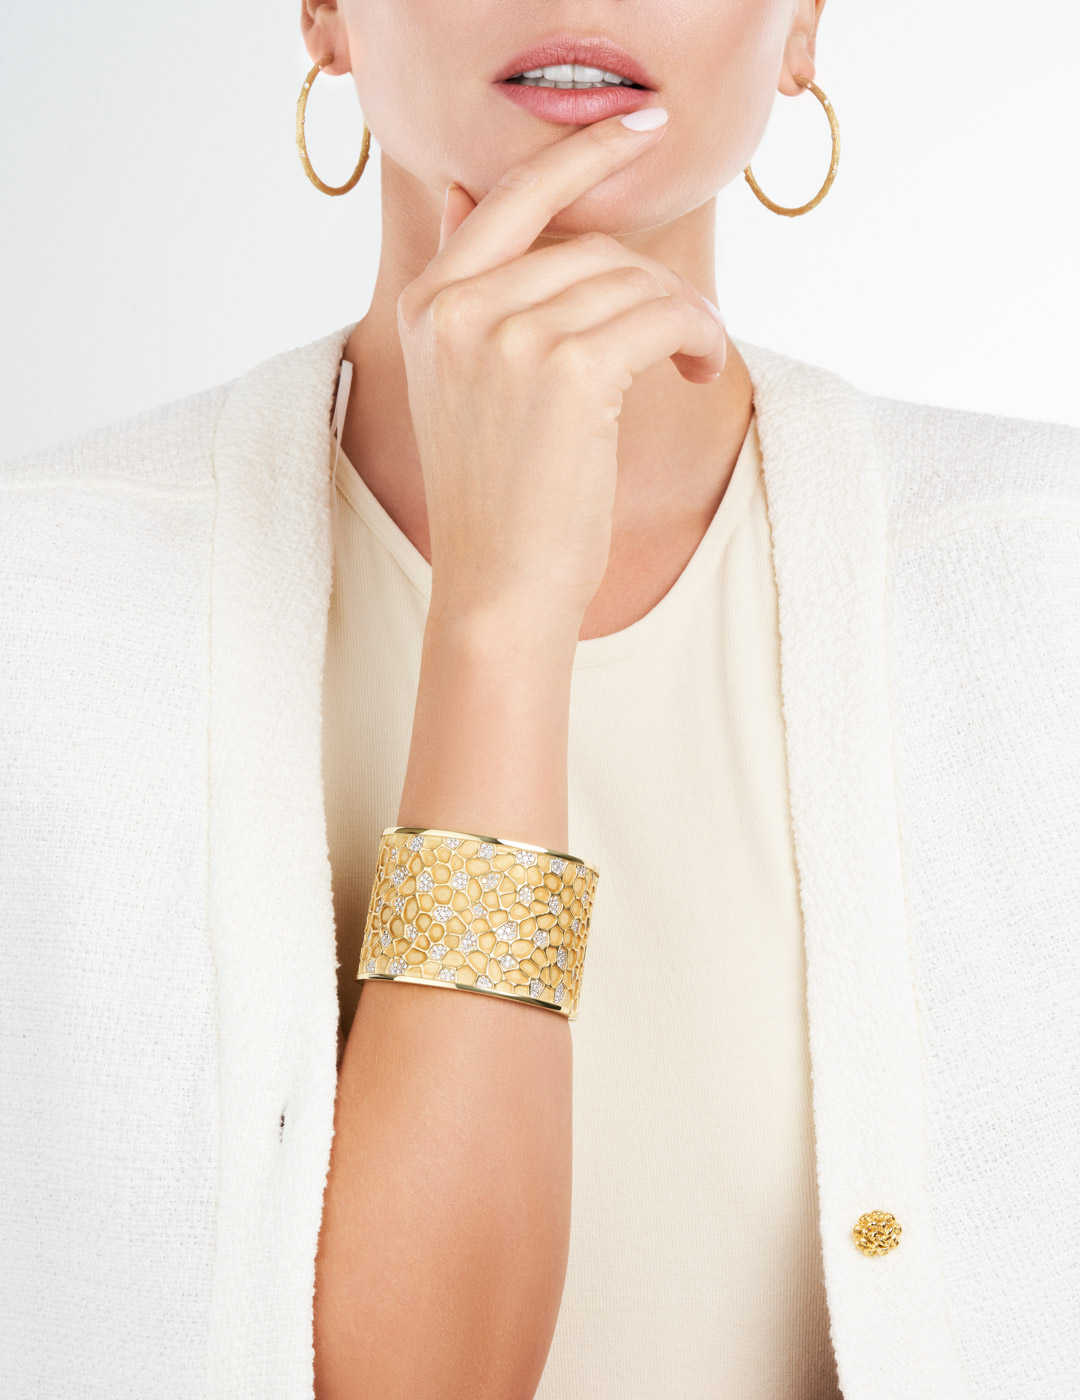 mish_jewelry_product_Honeywood-Cuff-2